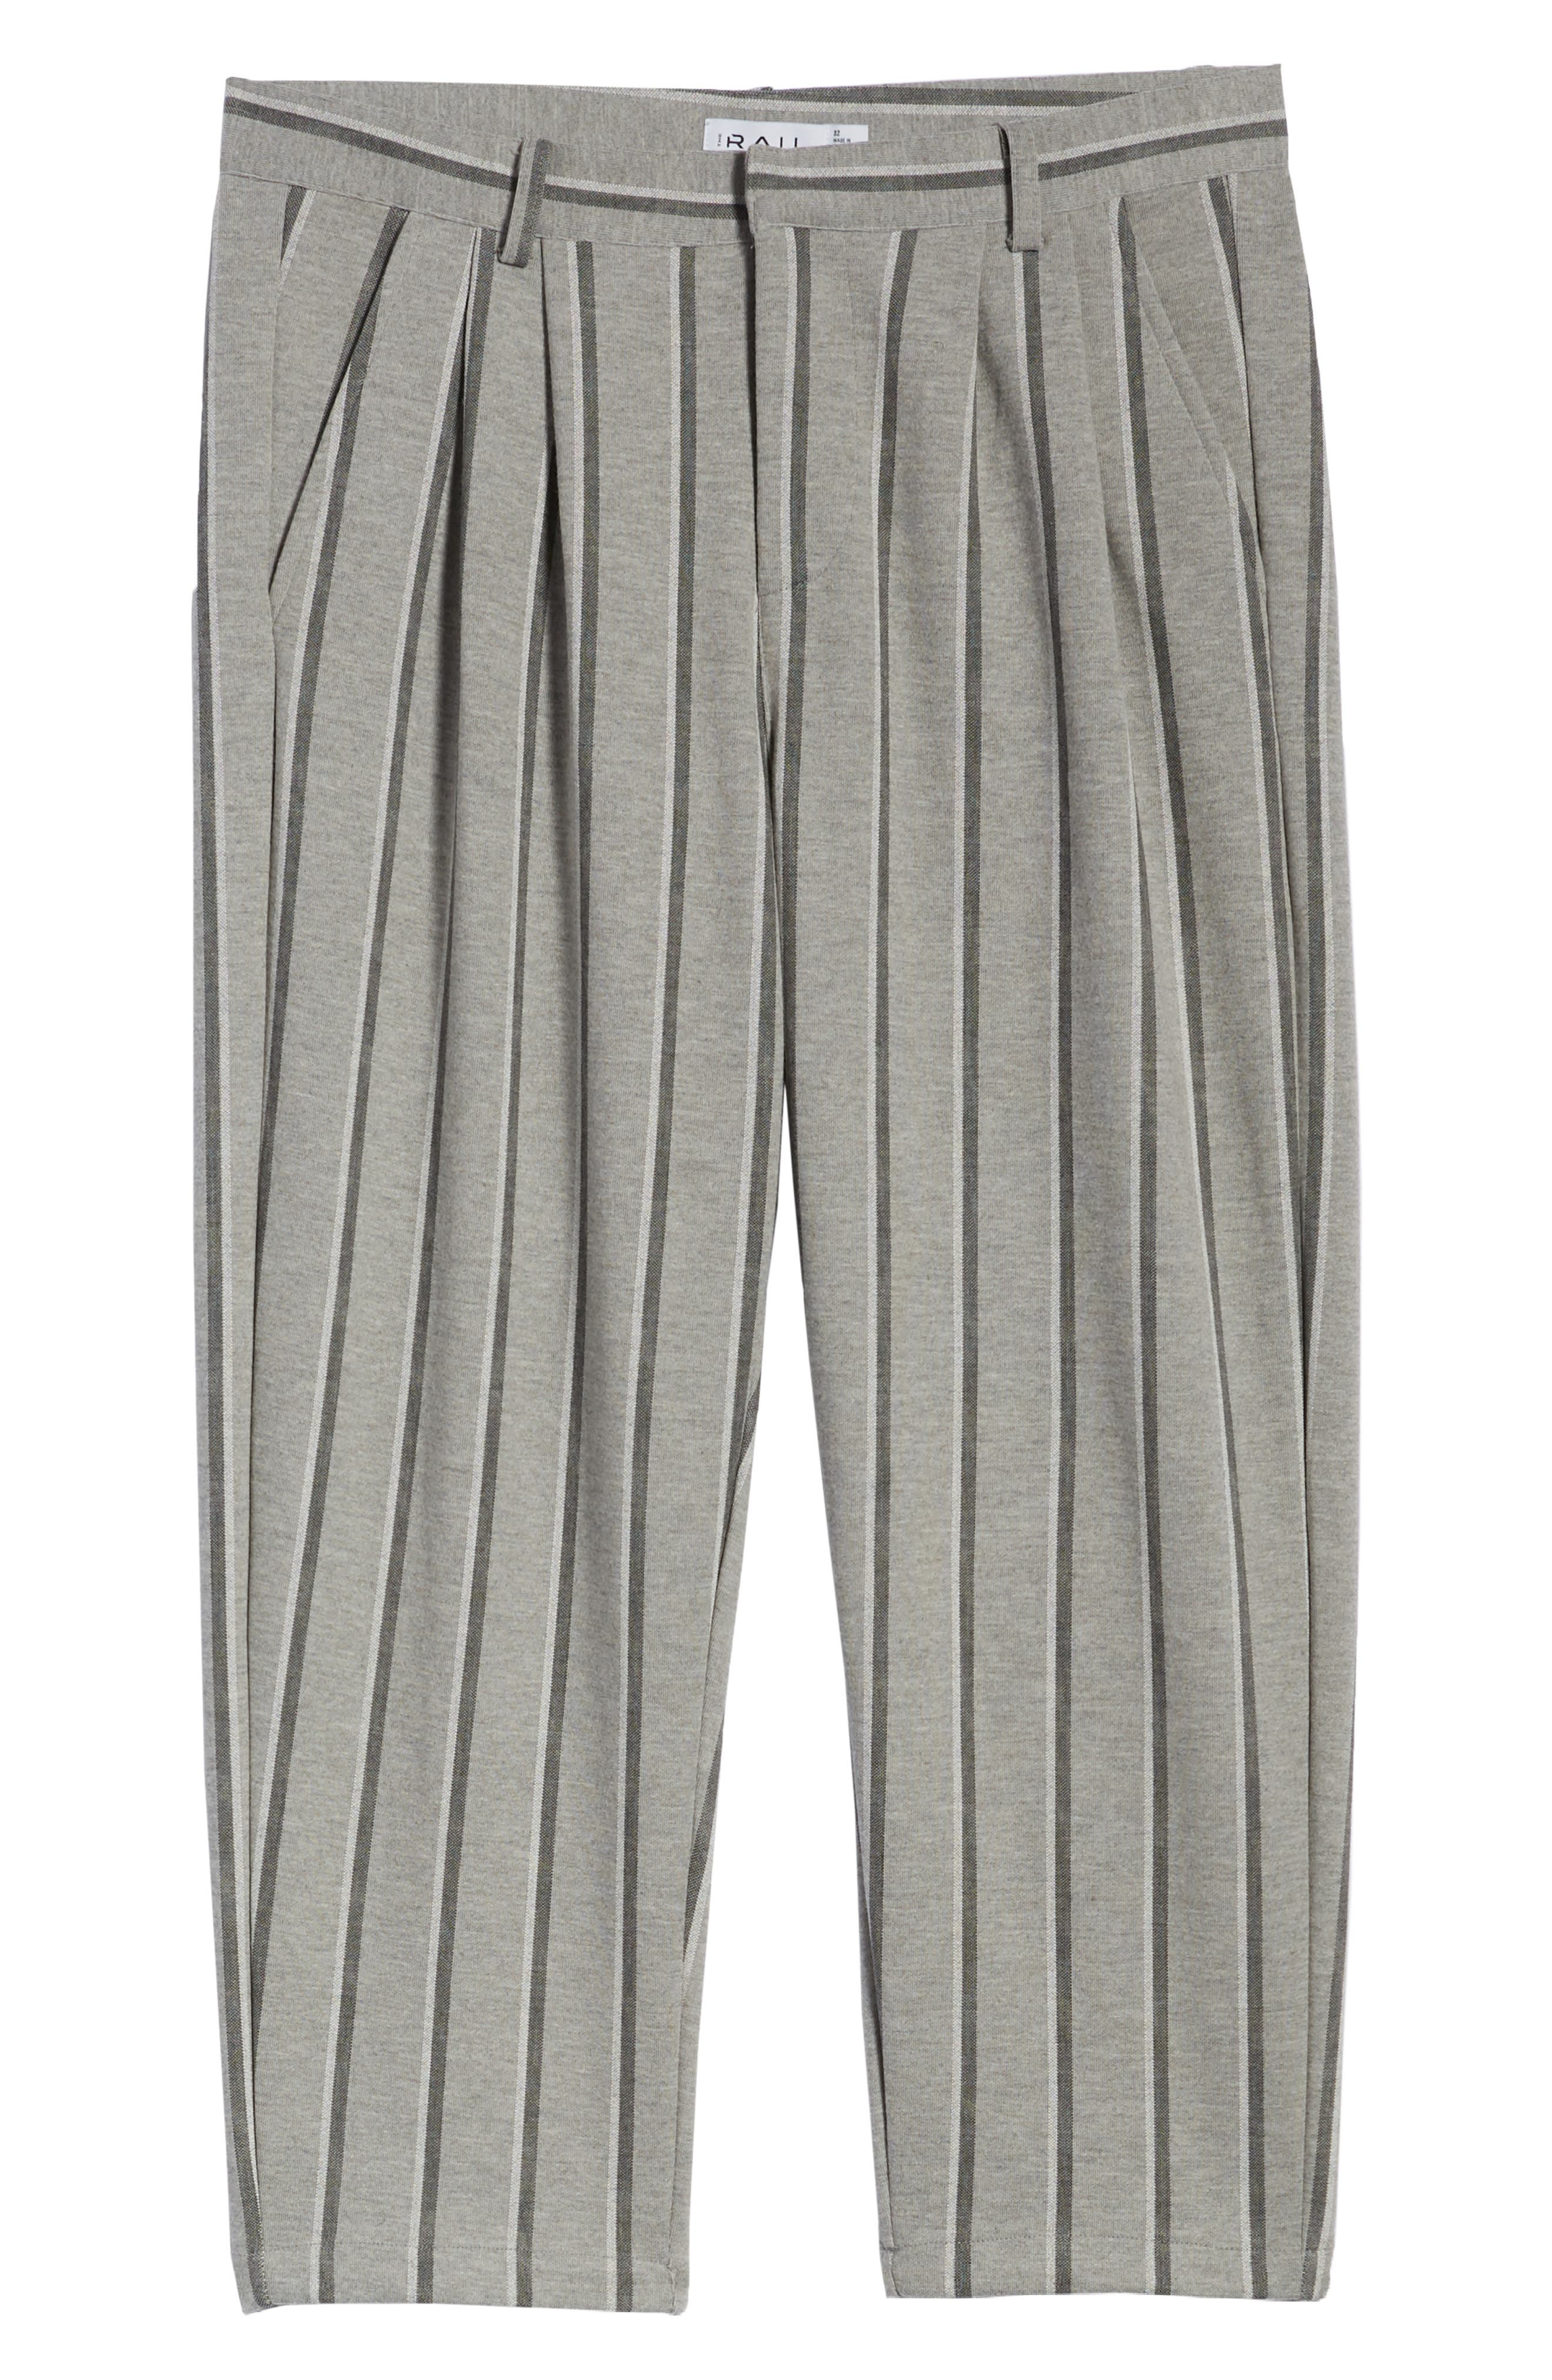 Pleated Plaid Crop Pants,                             Alternate thumbnail 6, color,                             GREY BLACK SHADOW STRIPE